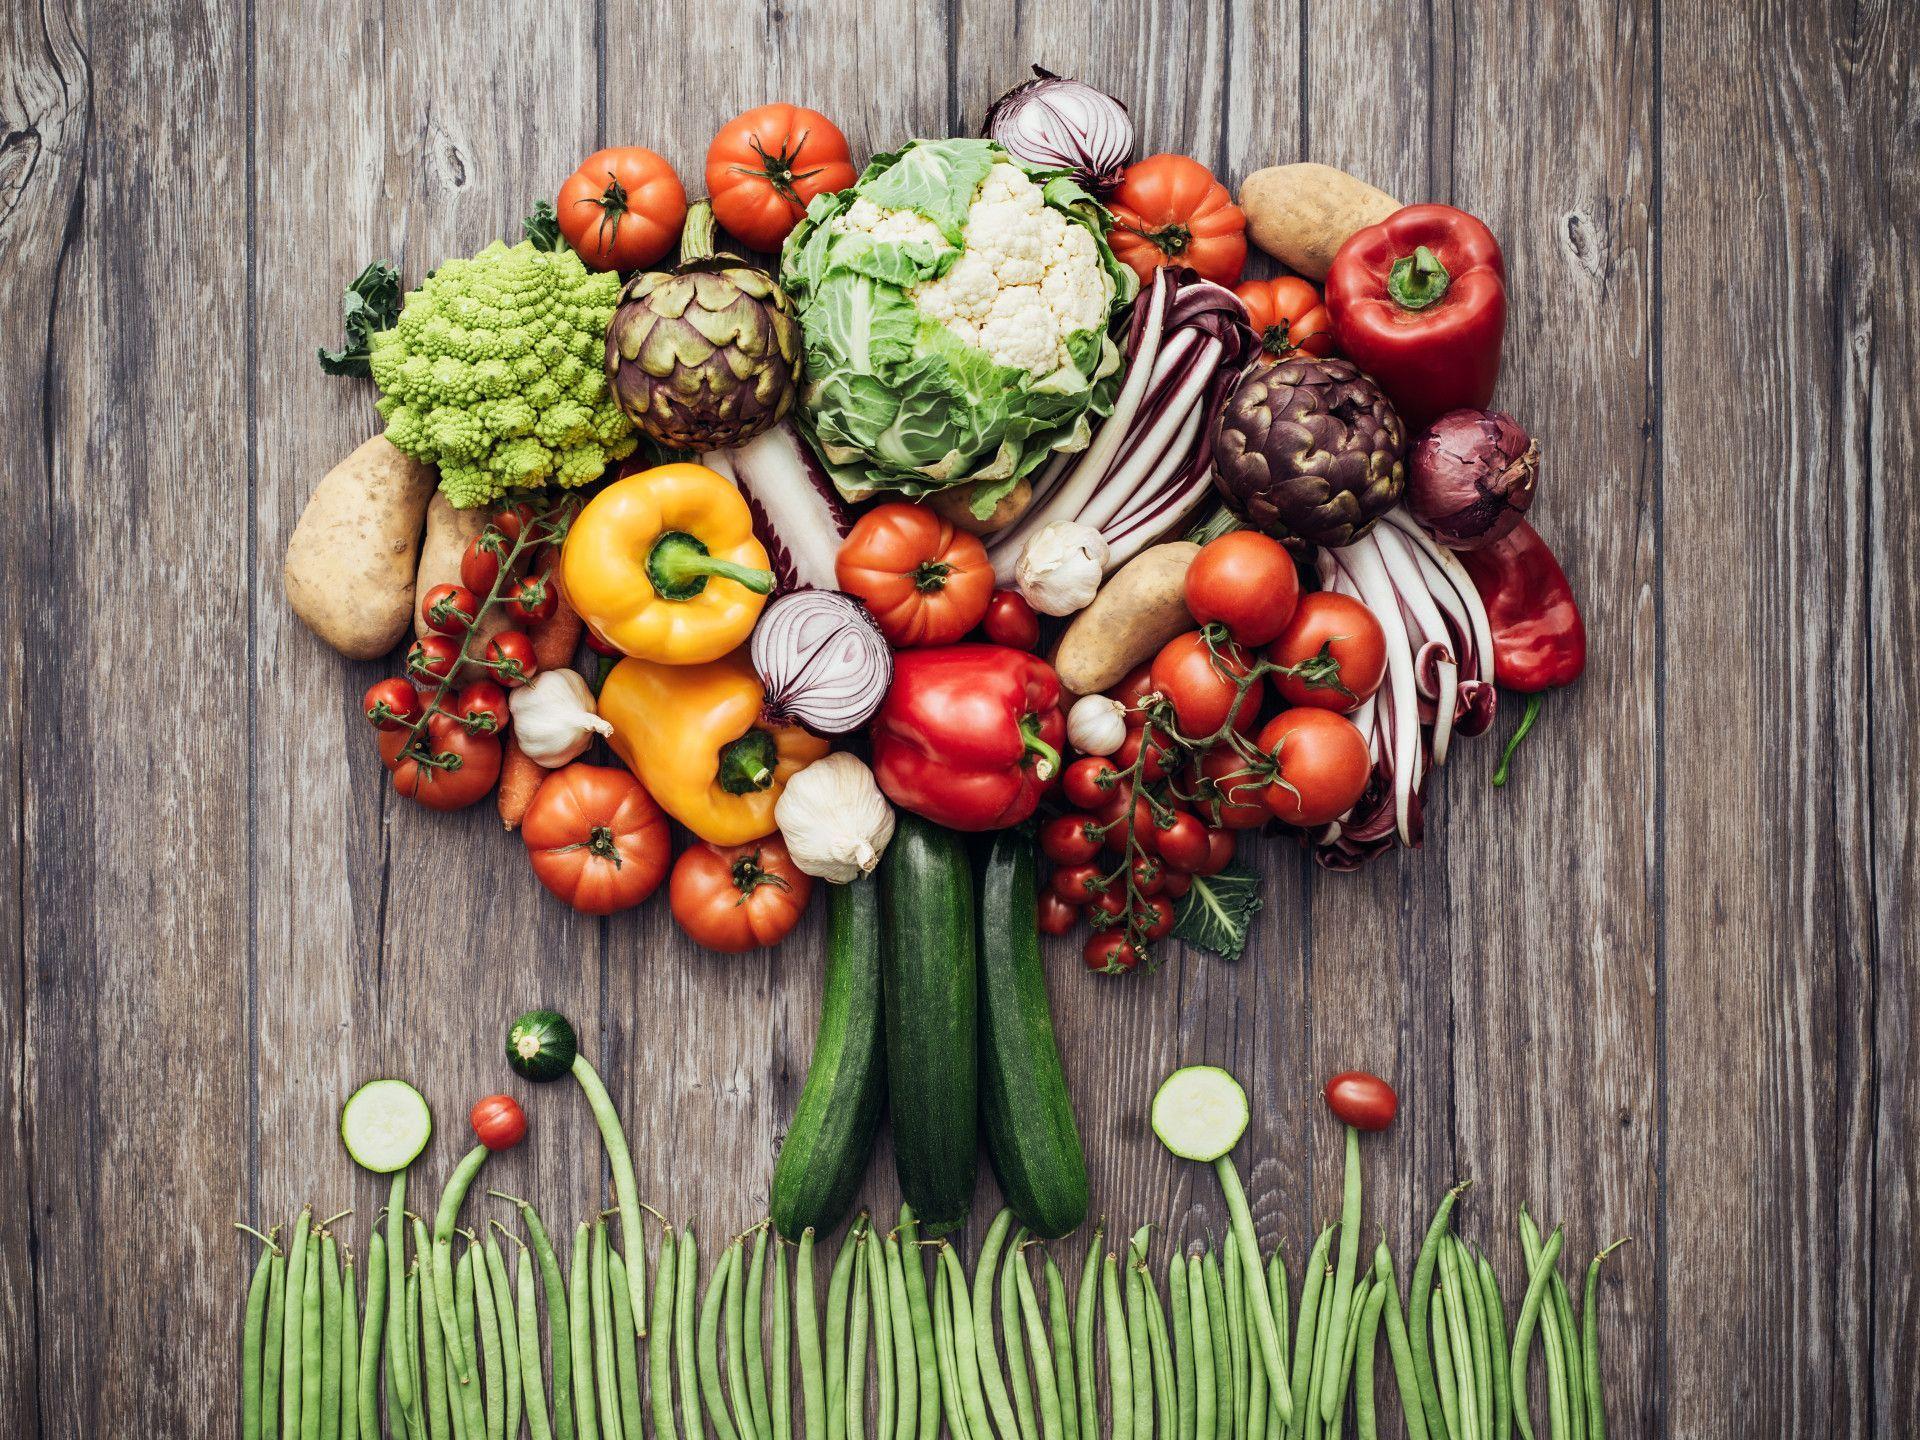 Vegan Food HD Wallpapers   20k, HD Vegan Food Backgrounds on ...